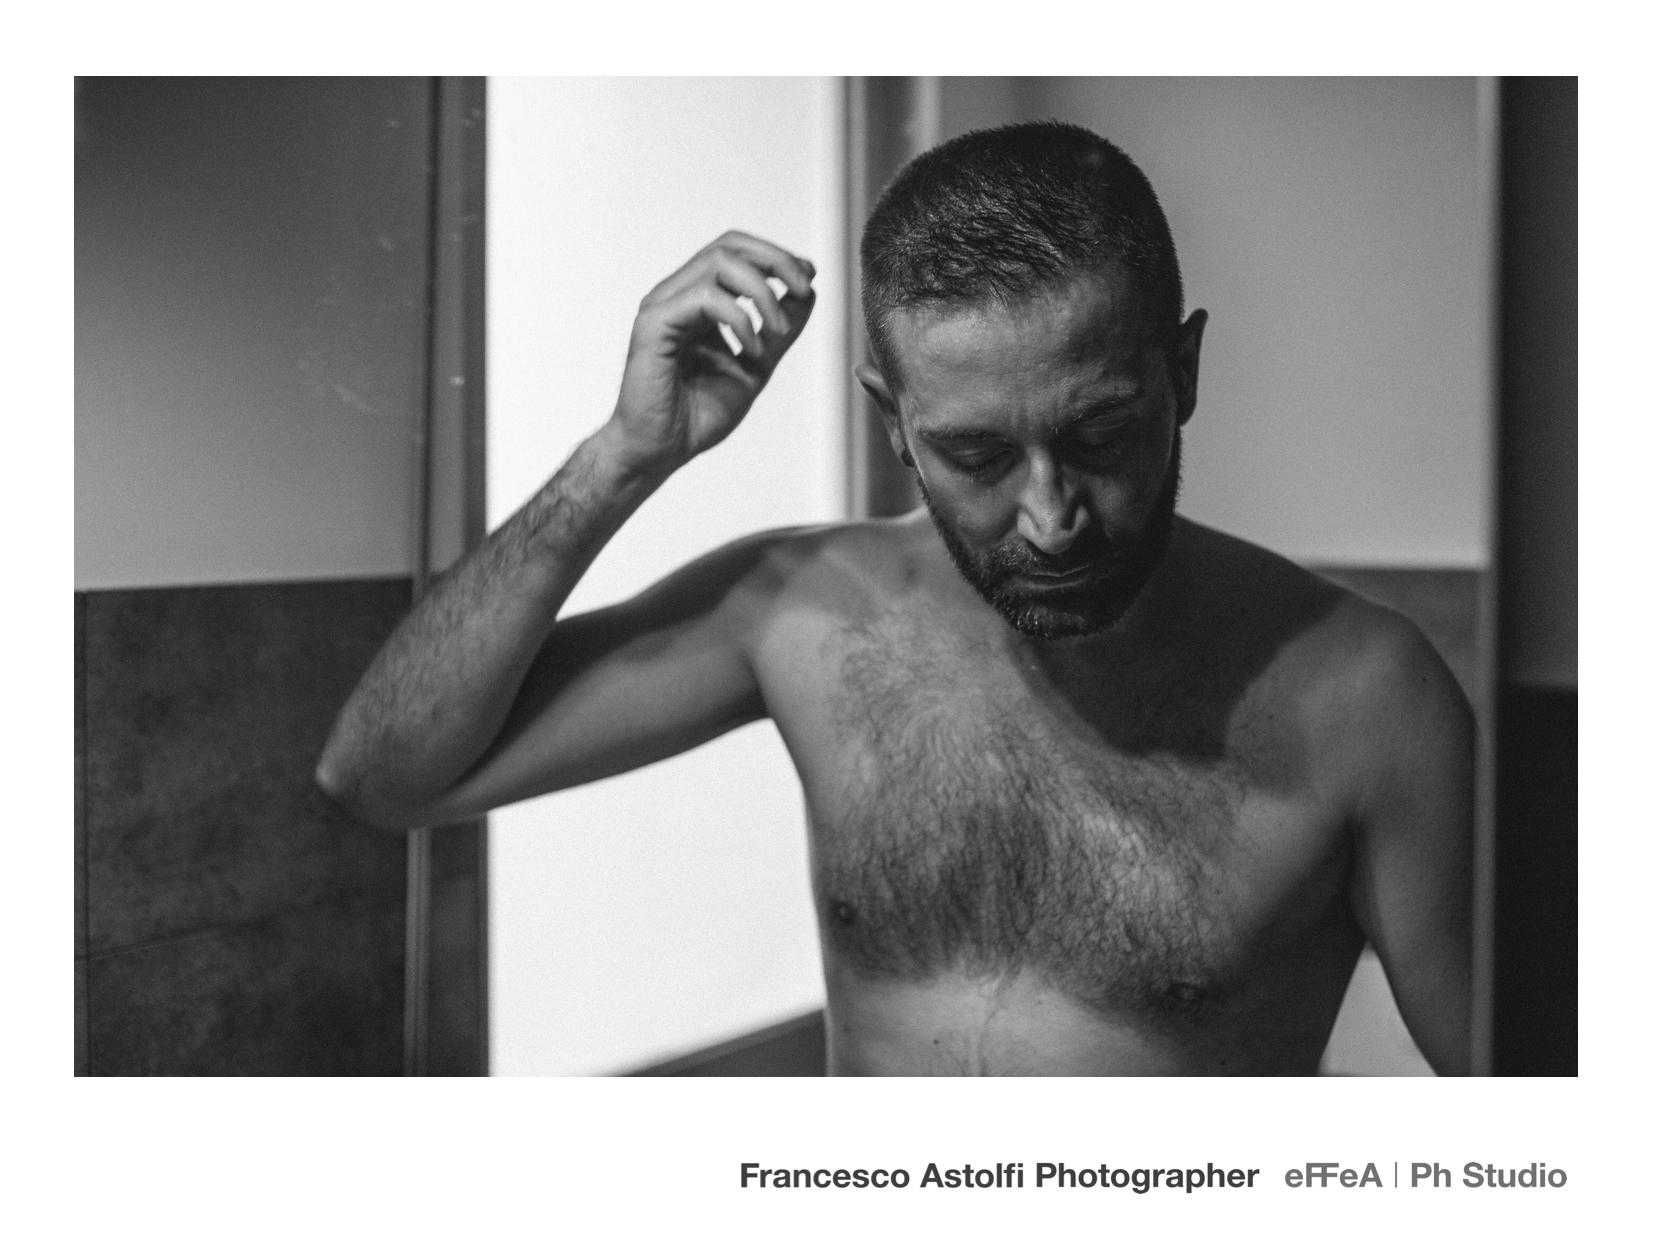 011 - ANDREA S. - Photo by Francesco Astolfi